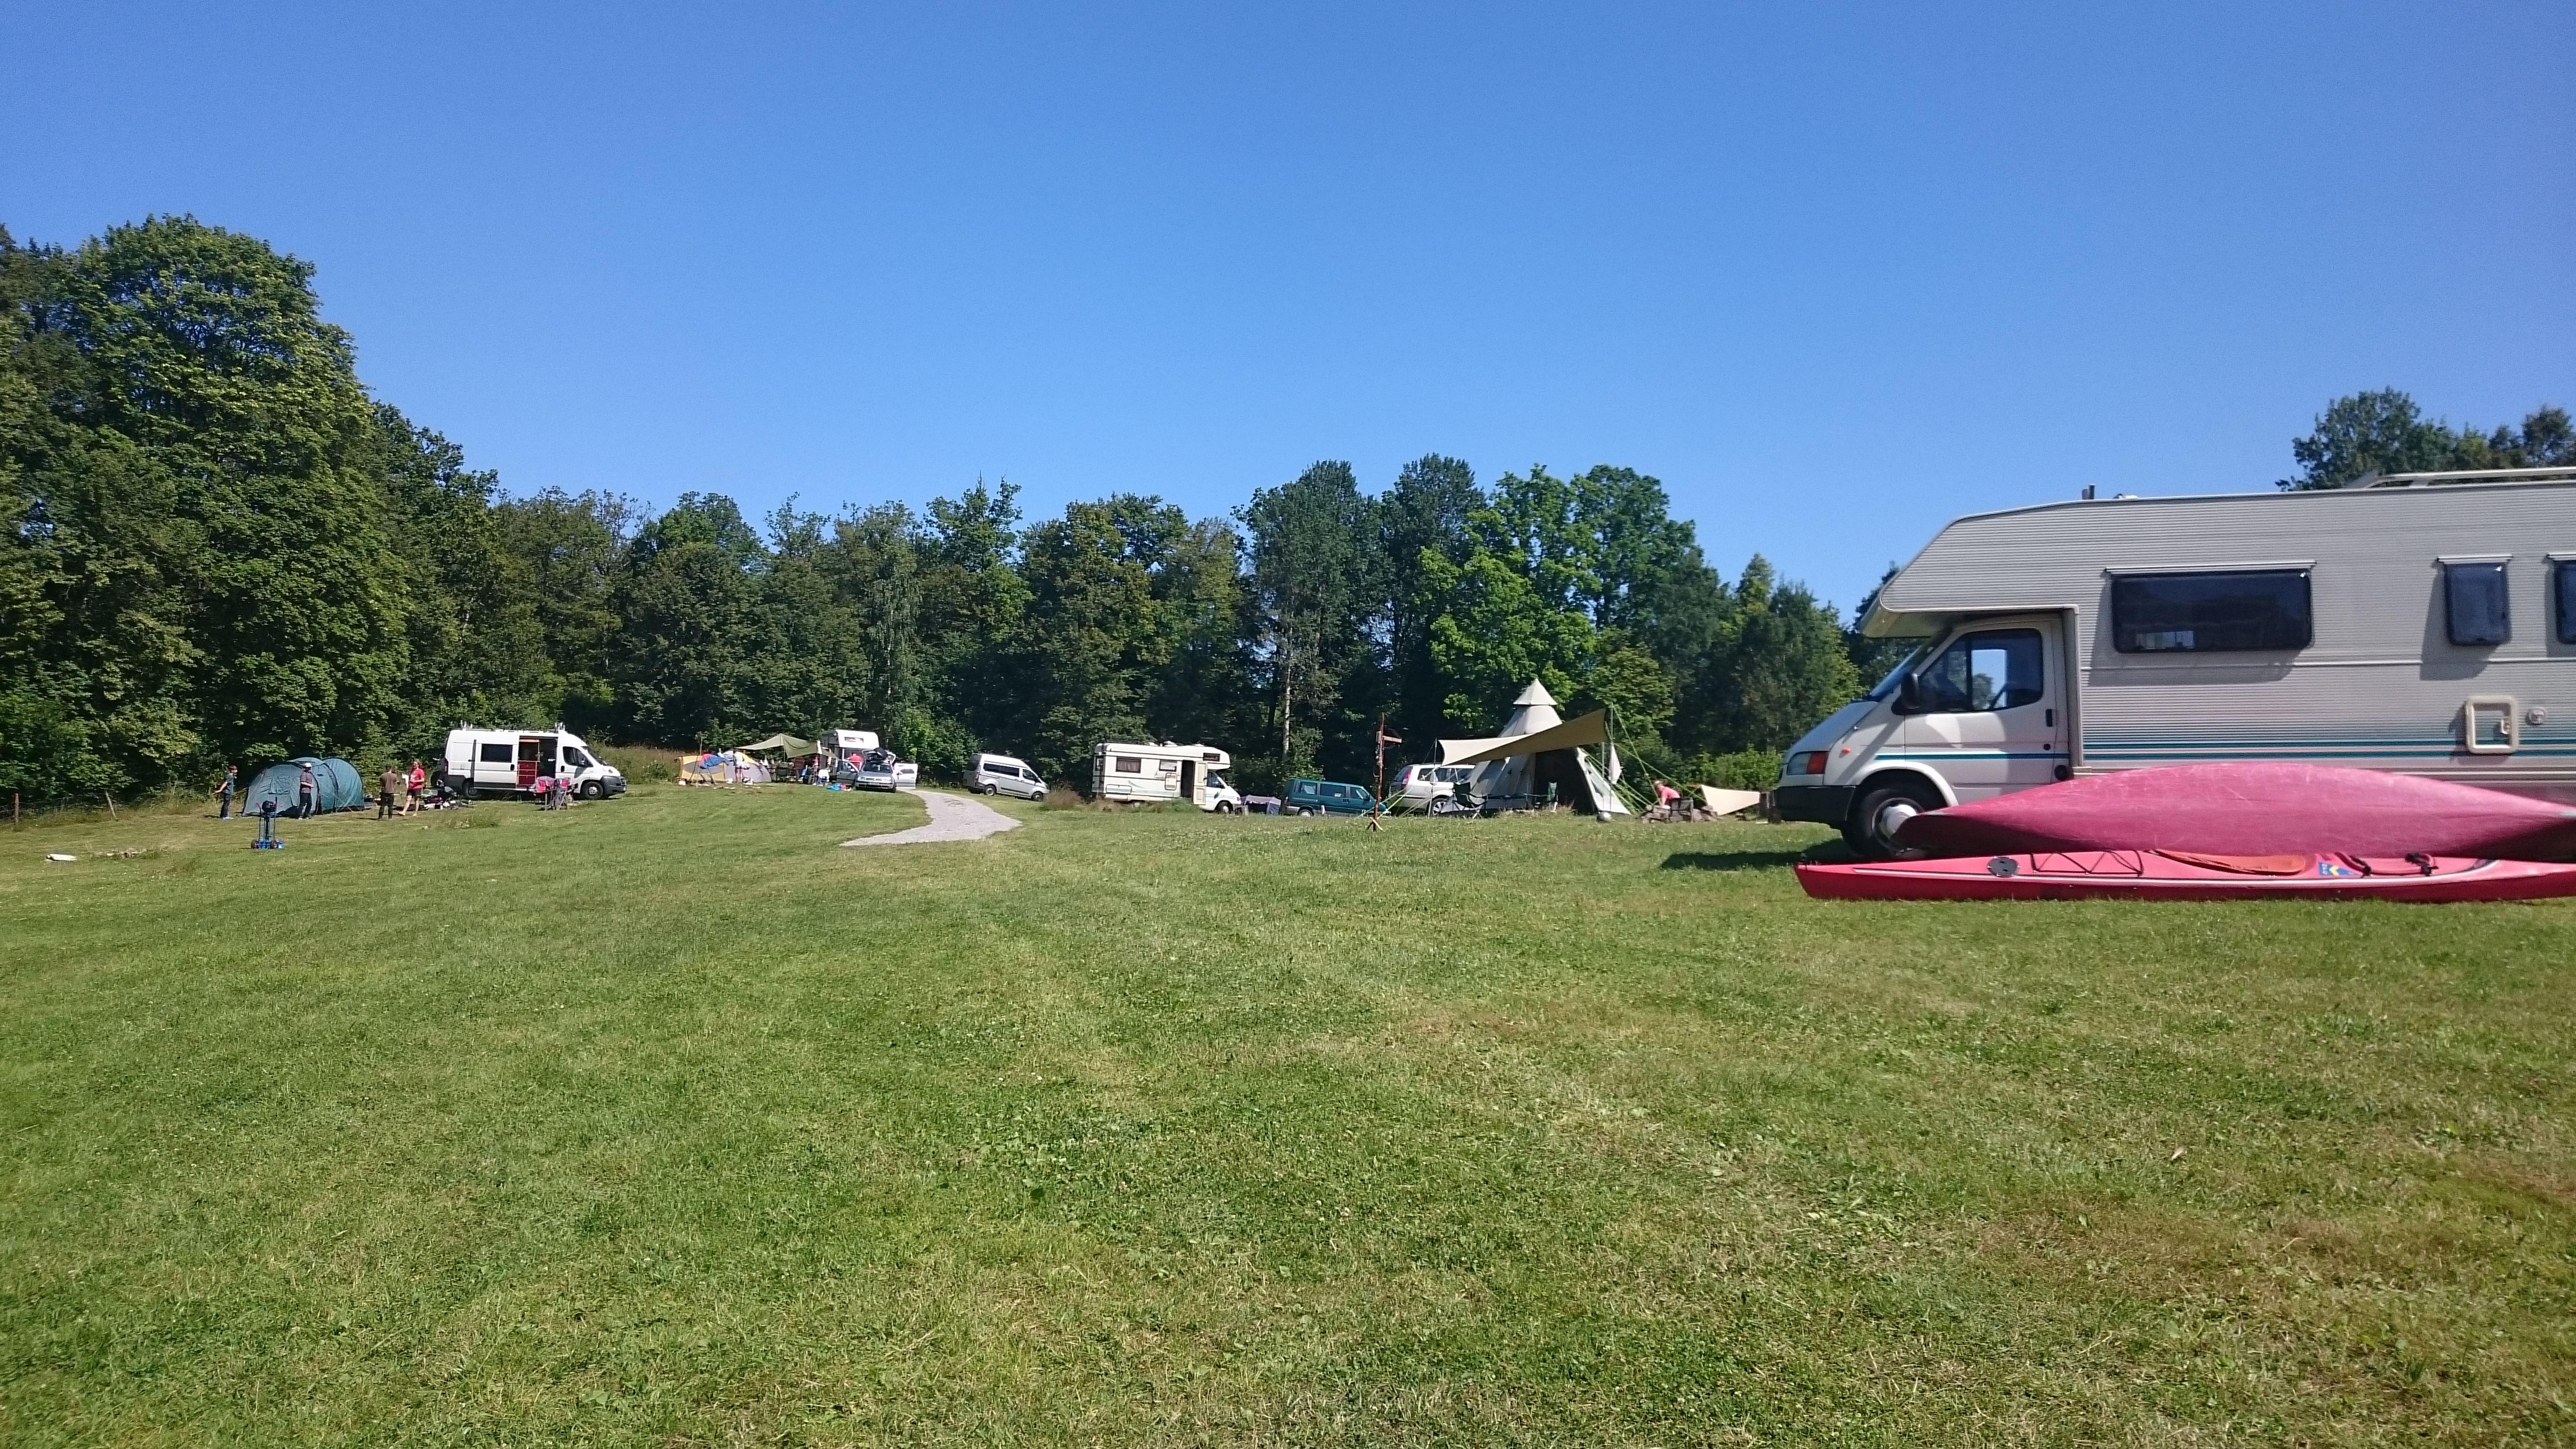 Rotahult Naturcampingplatz